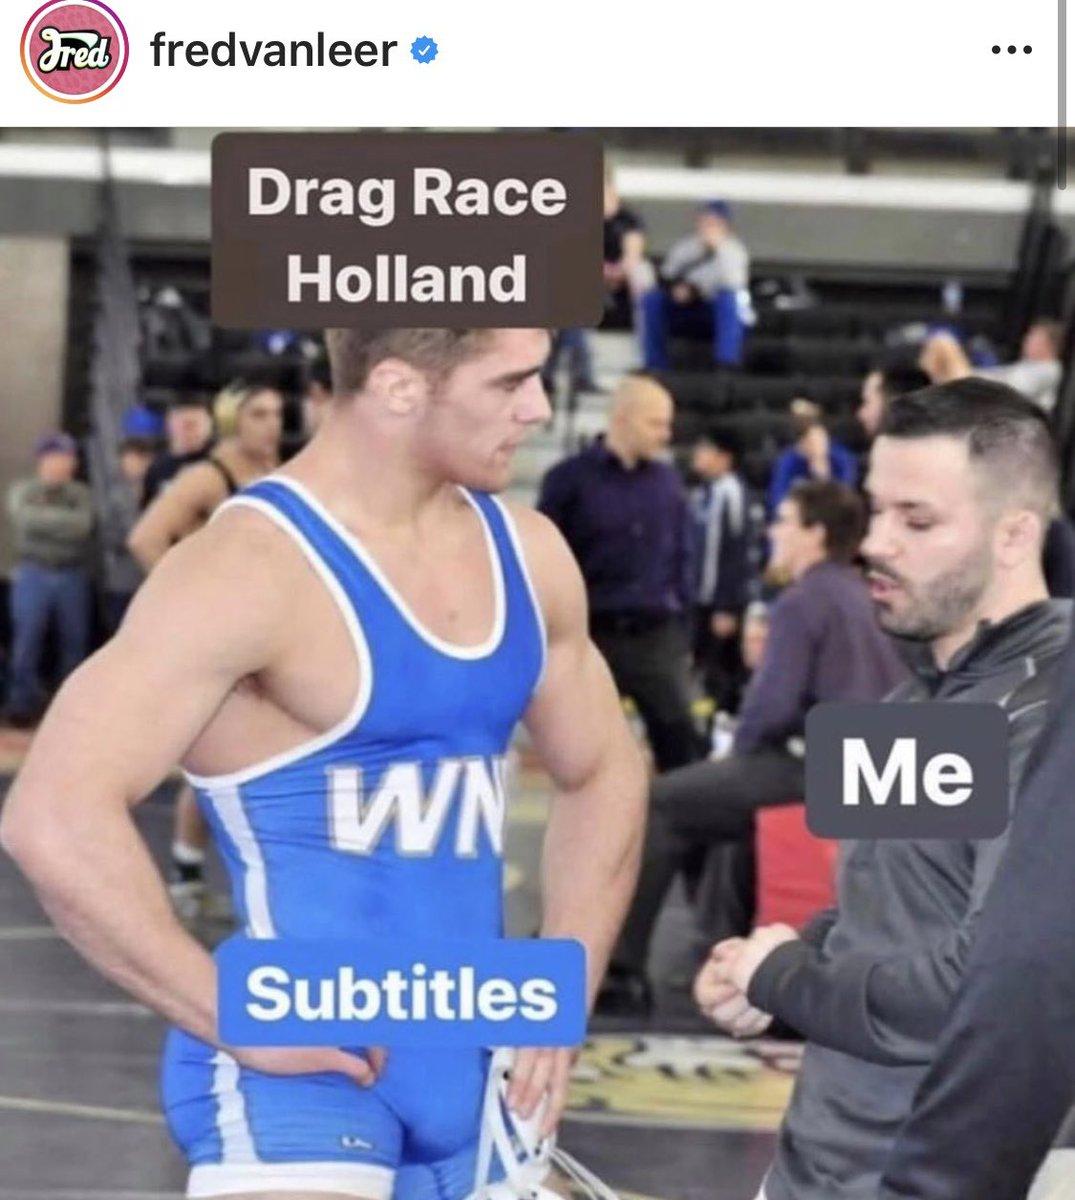 #DragRaceHolland subtitles https://t.co/2xCChVj6oG